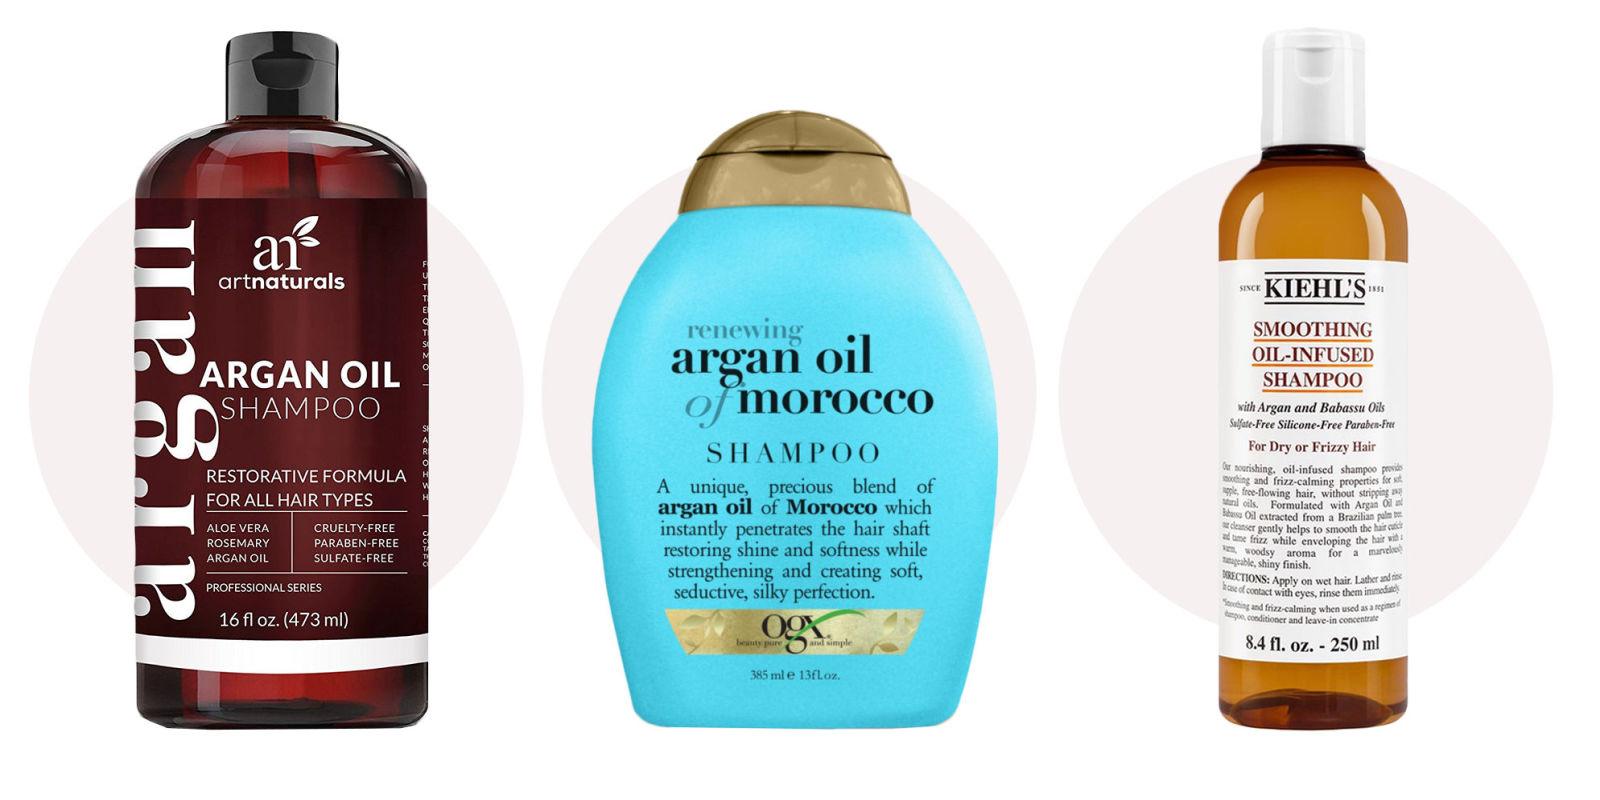 9 Best Argan Oil Shampoos In 2018 Hydrating Shampoo With